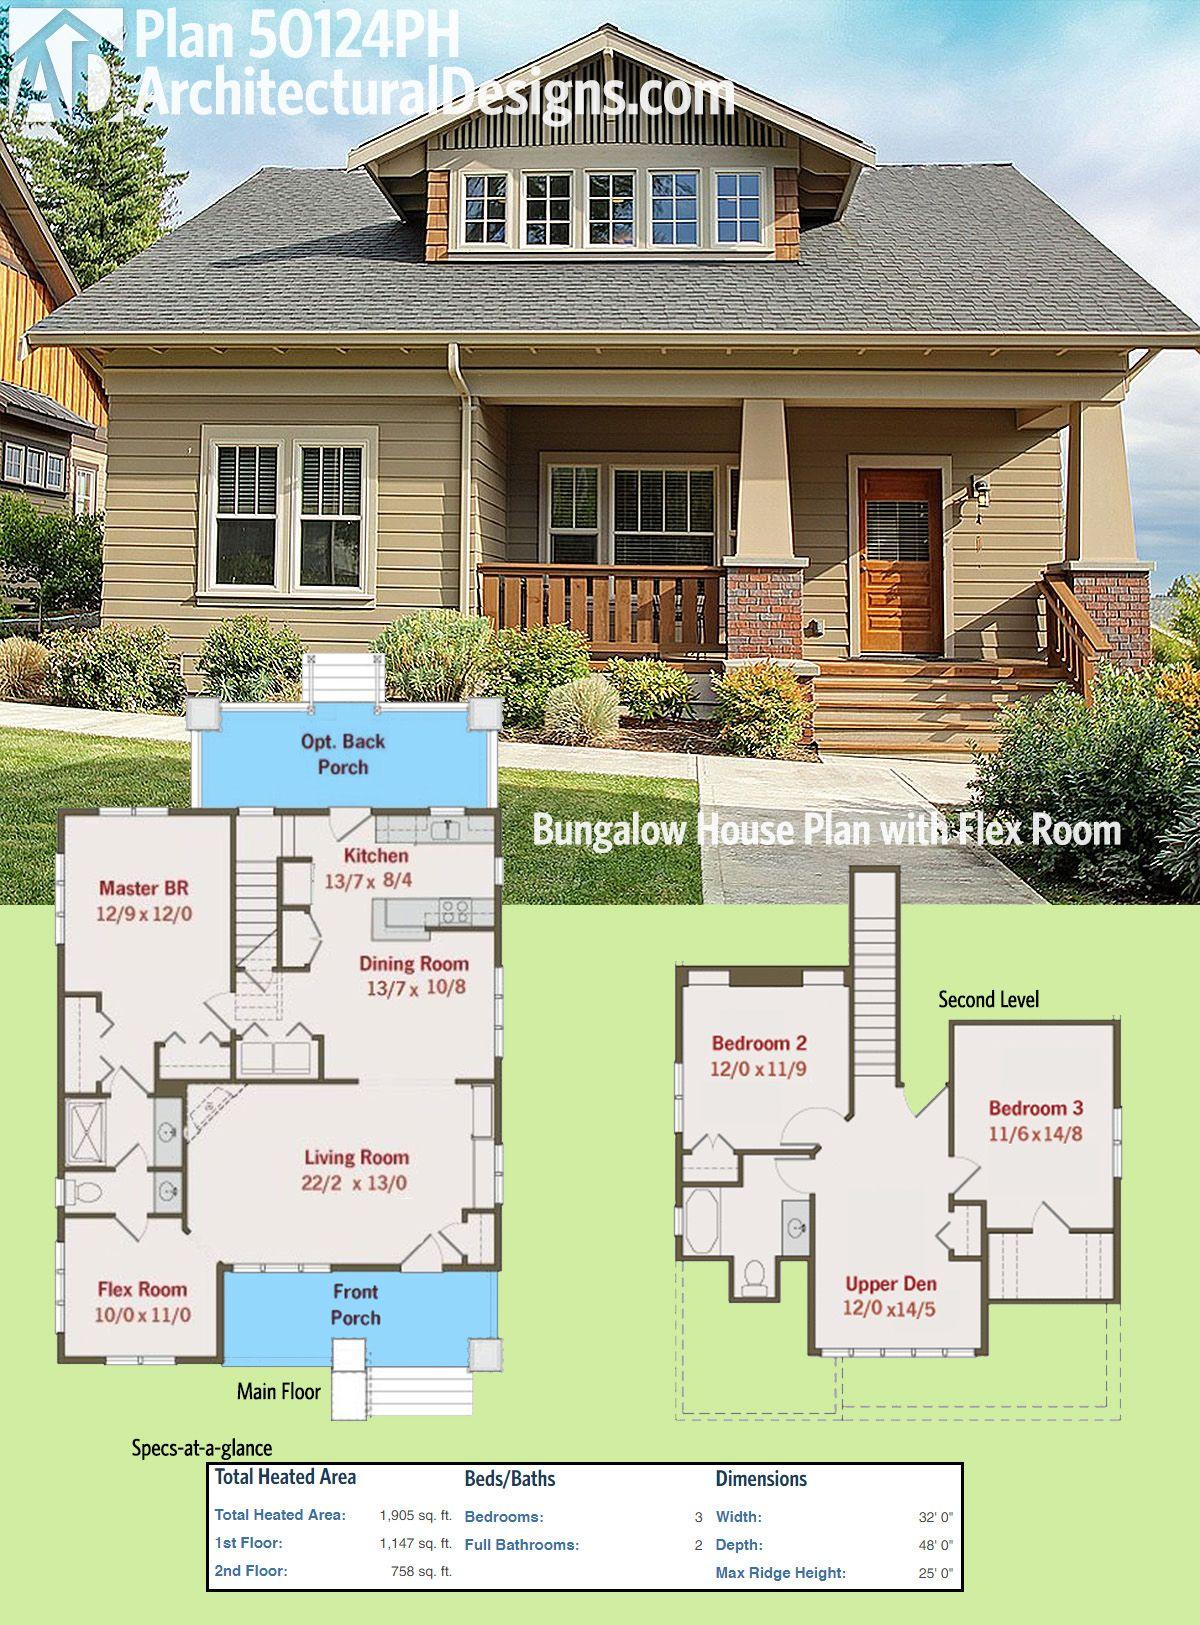 Architectural Designs Bungalow House Plan 50124PH has